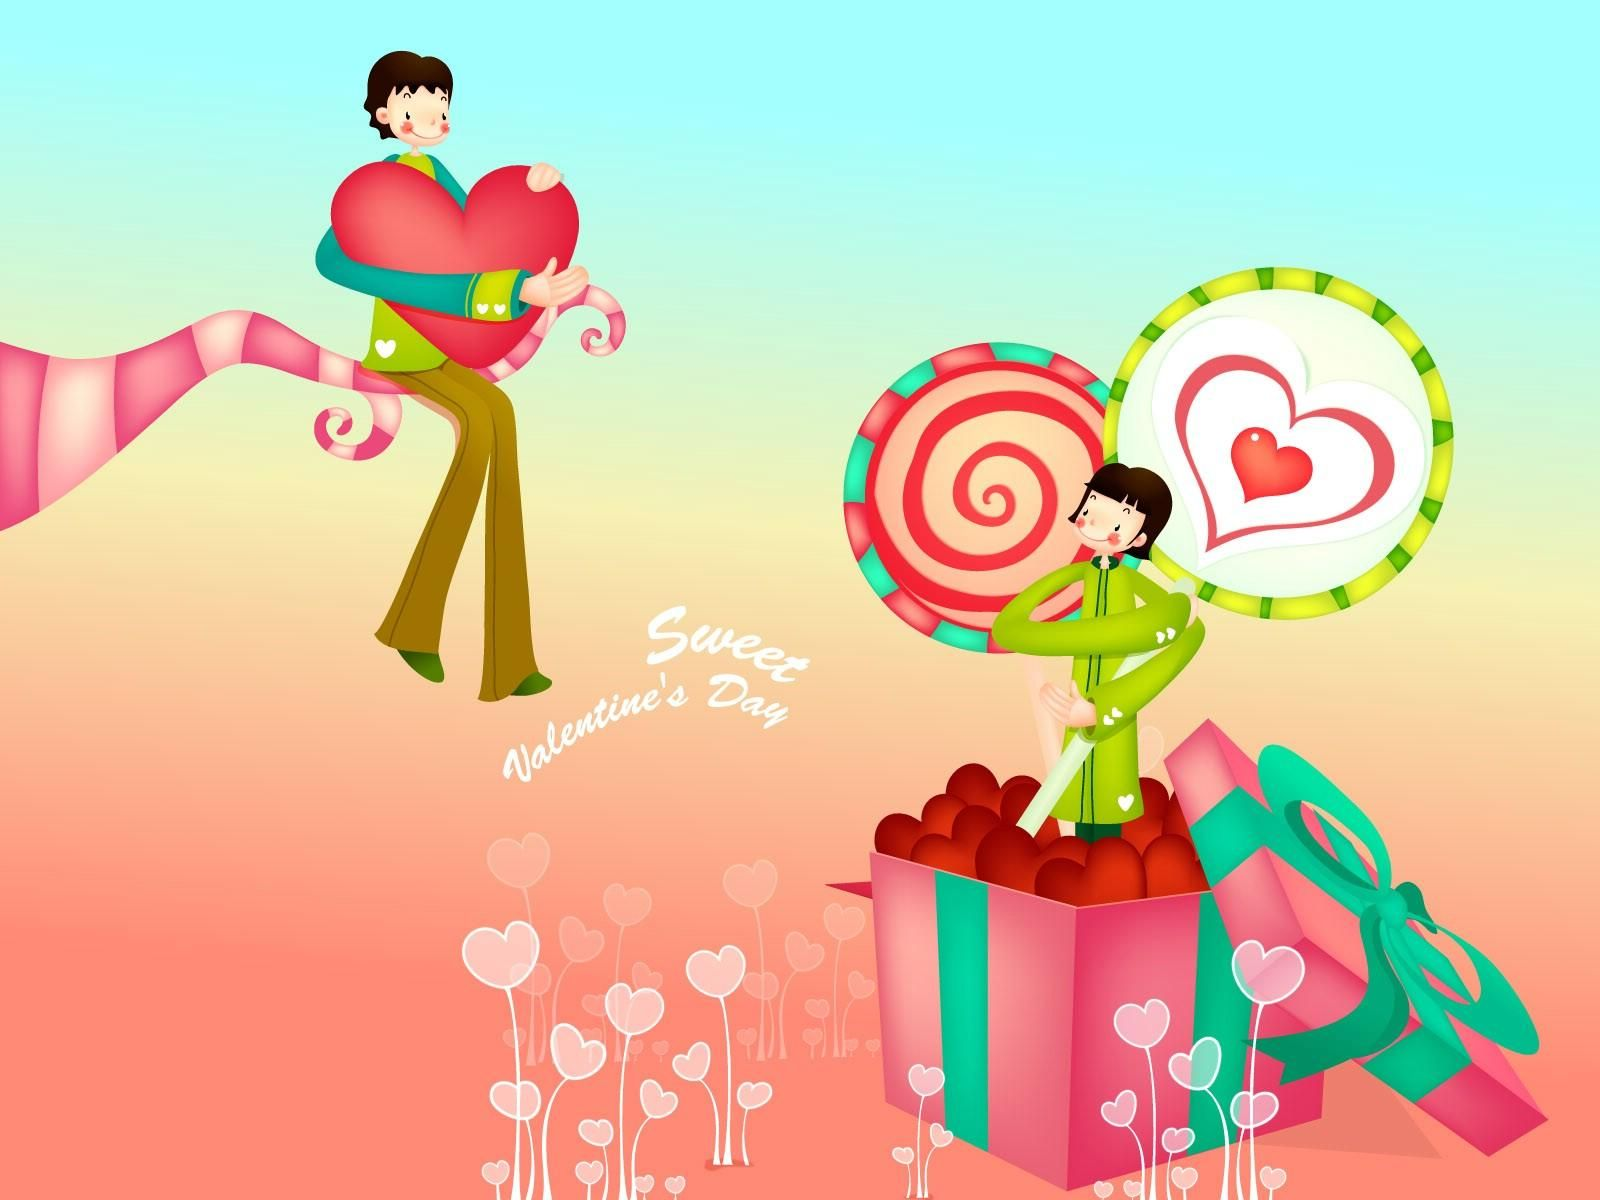 http://rozup.ir/view/194676/eshgholia-wallpaper-fantezi-love%20(5).jpg